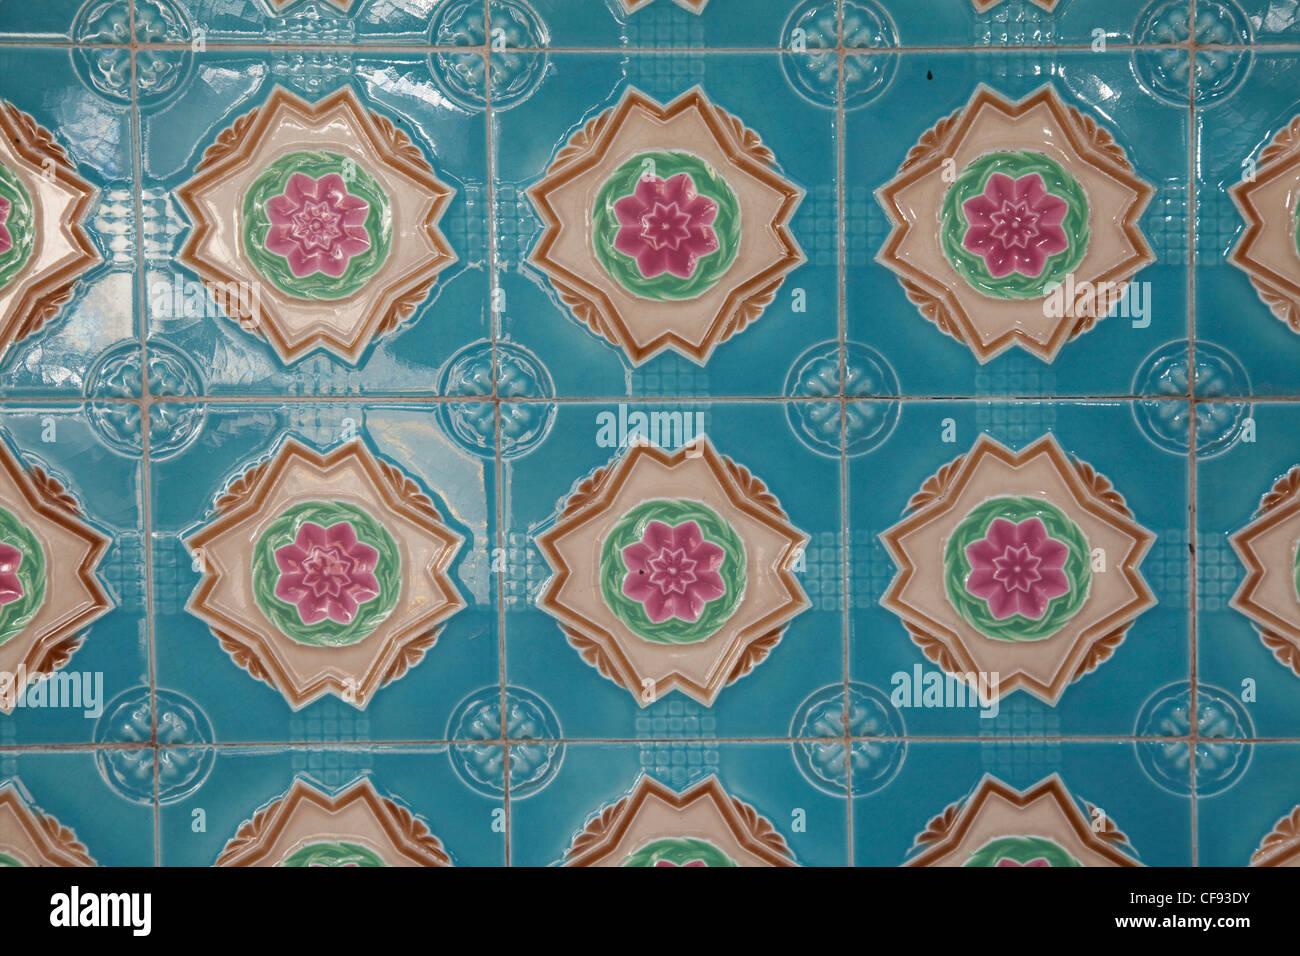 Vintage wall tiles Club Sreet area - Stock Image